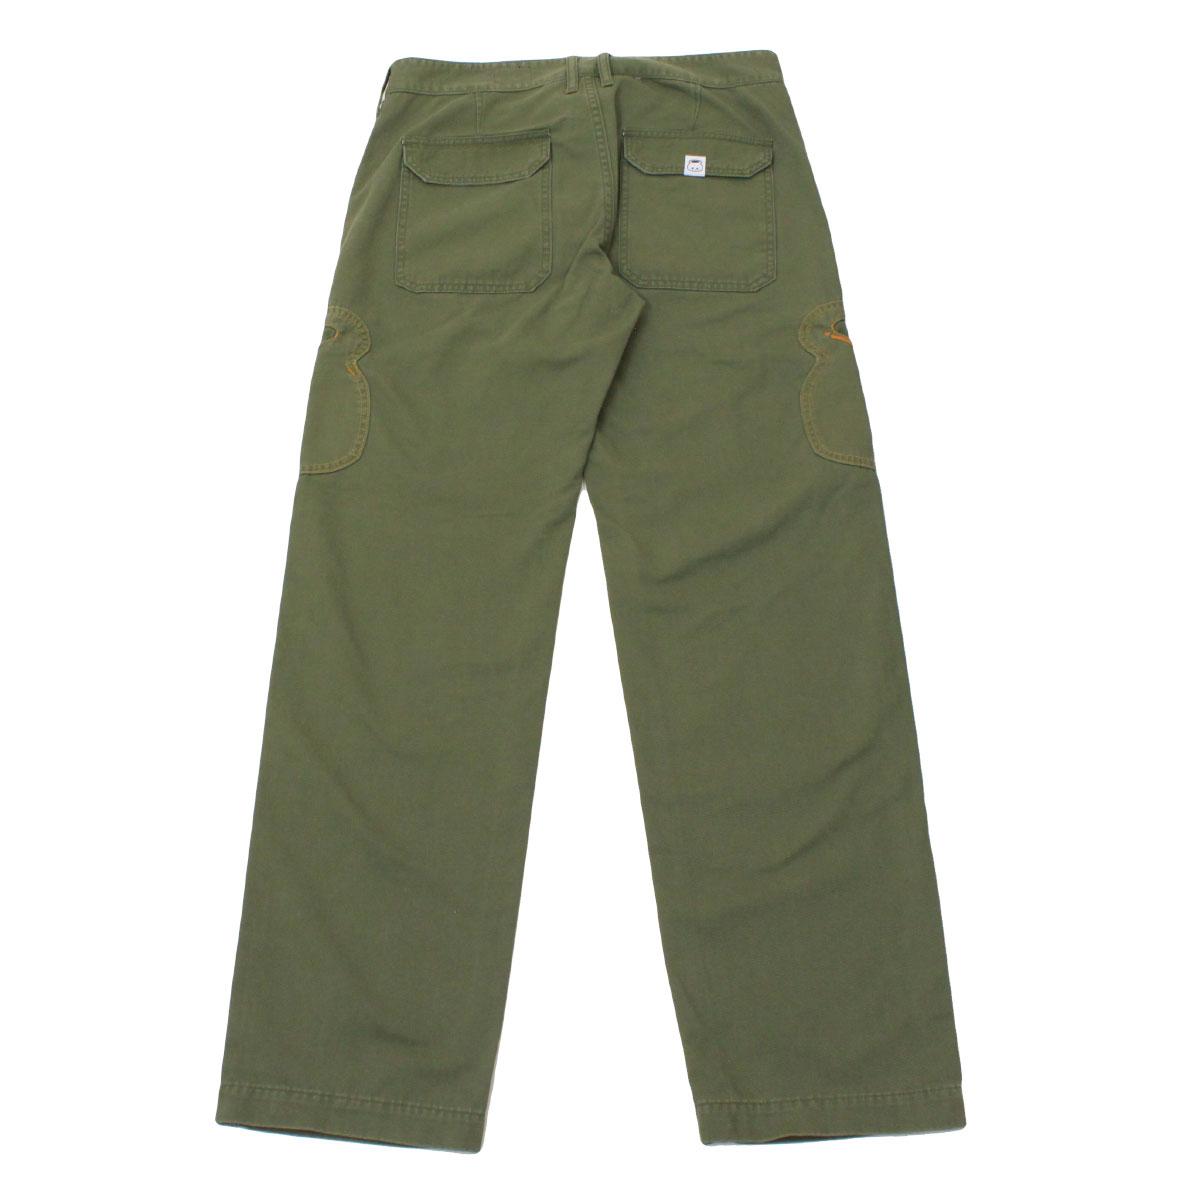 B!nn Cargo Pants (Khaki)